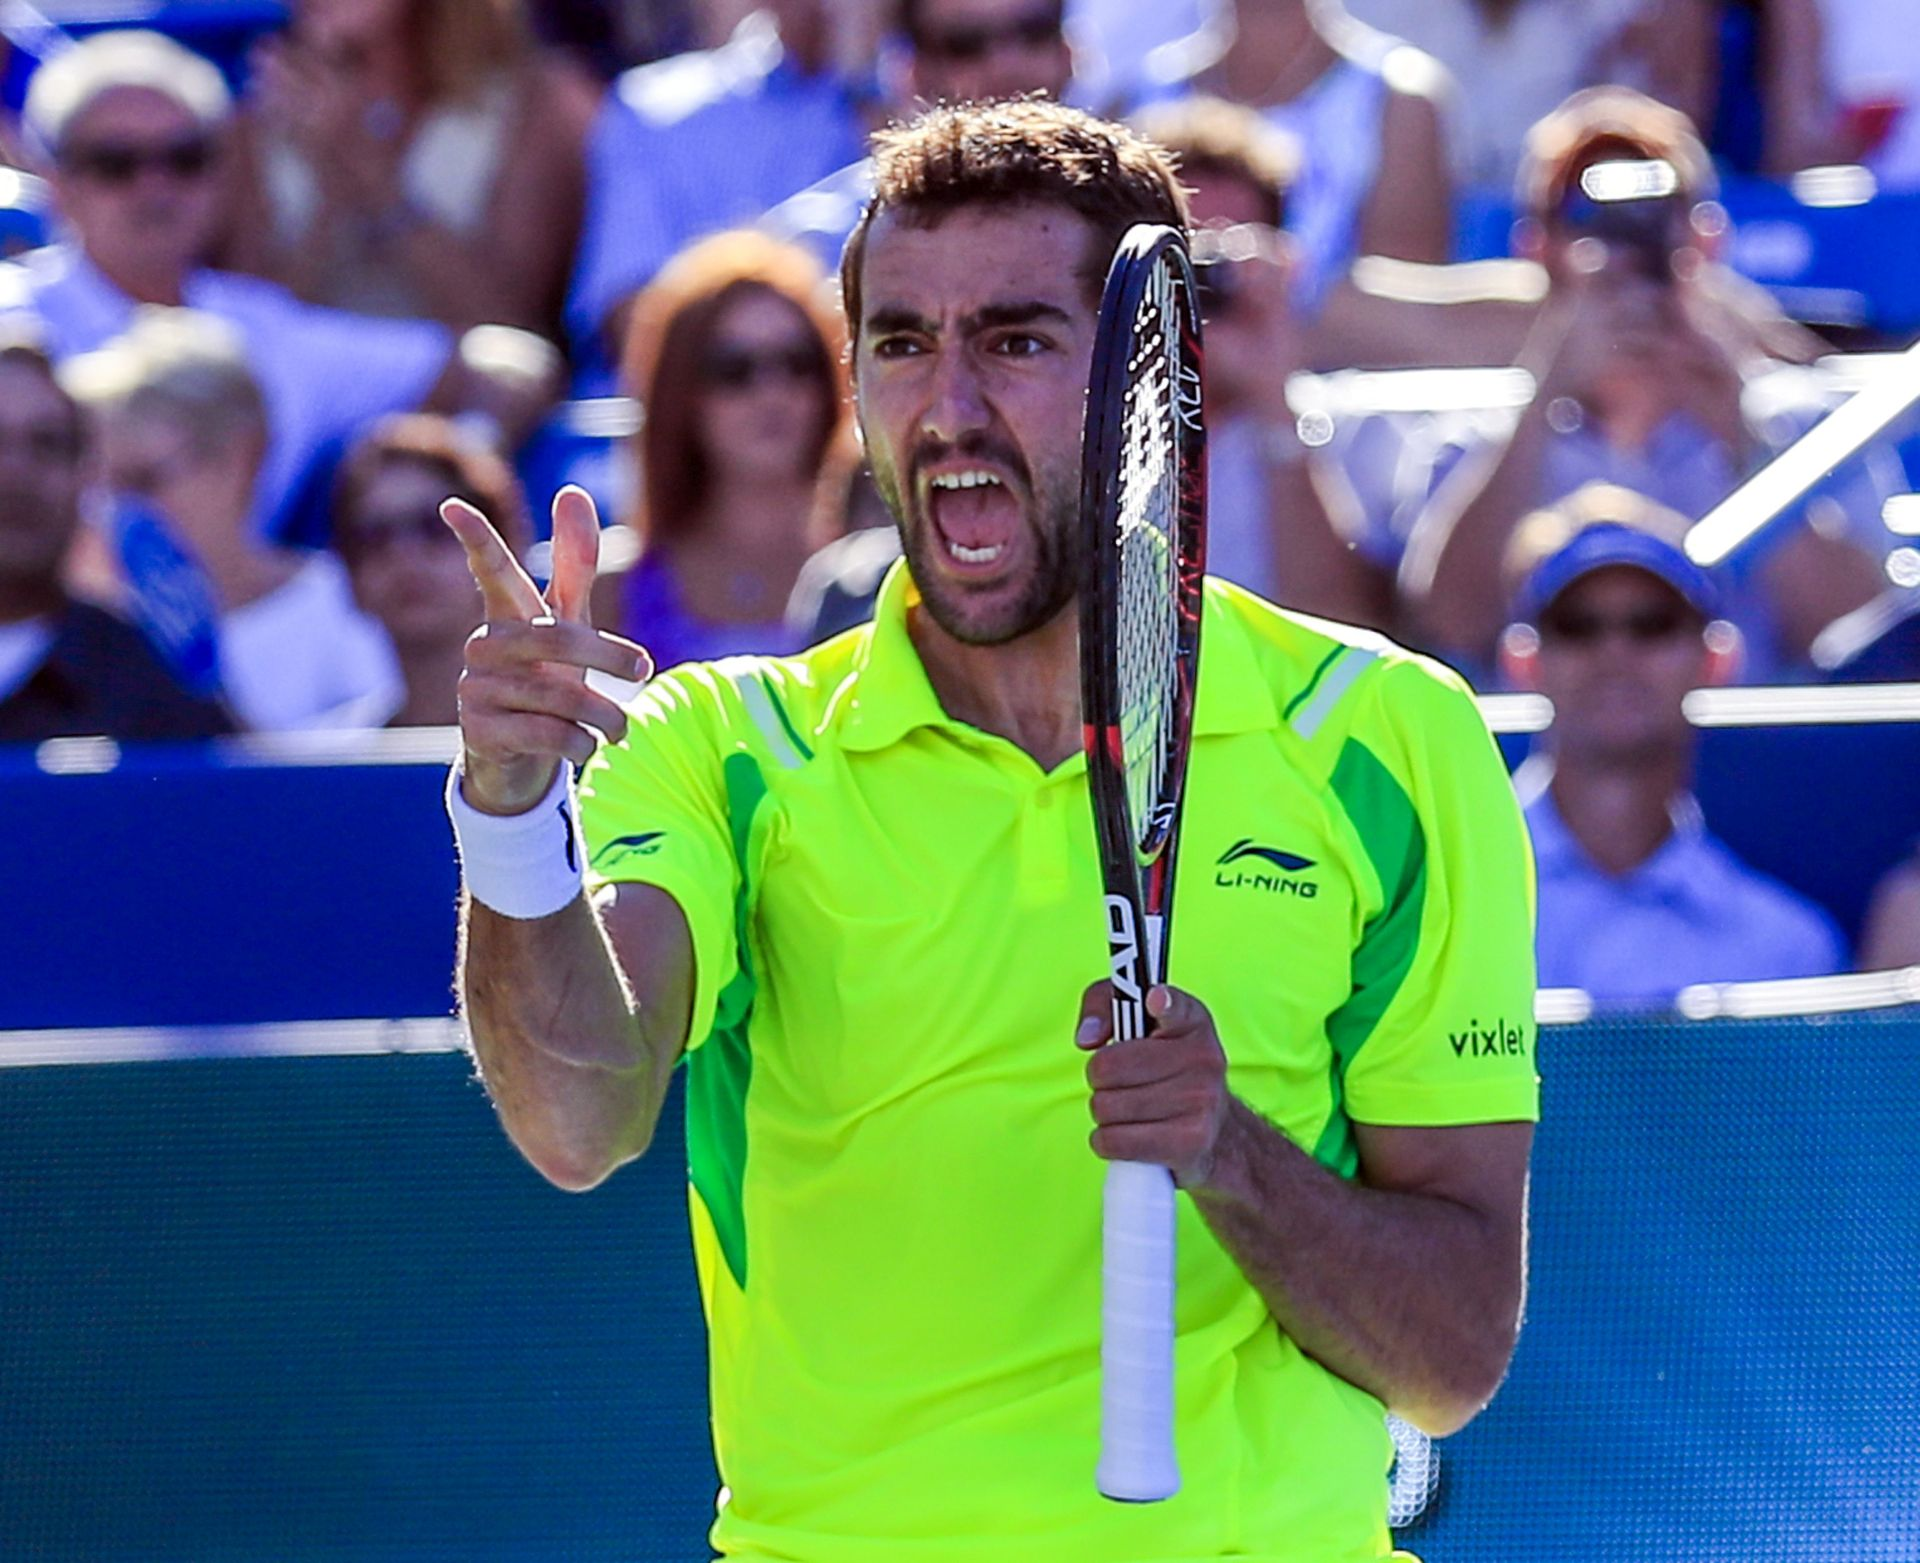 ATP LJESTVICA Čilić osmi, Ćorić 41., Nadal preskočio Federera